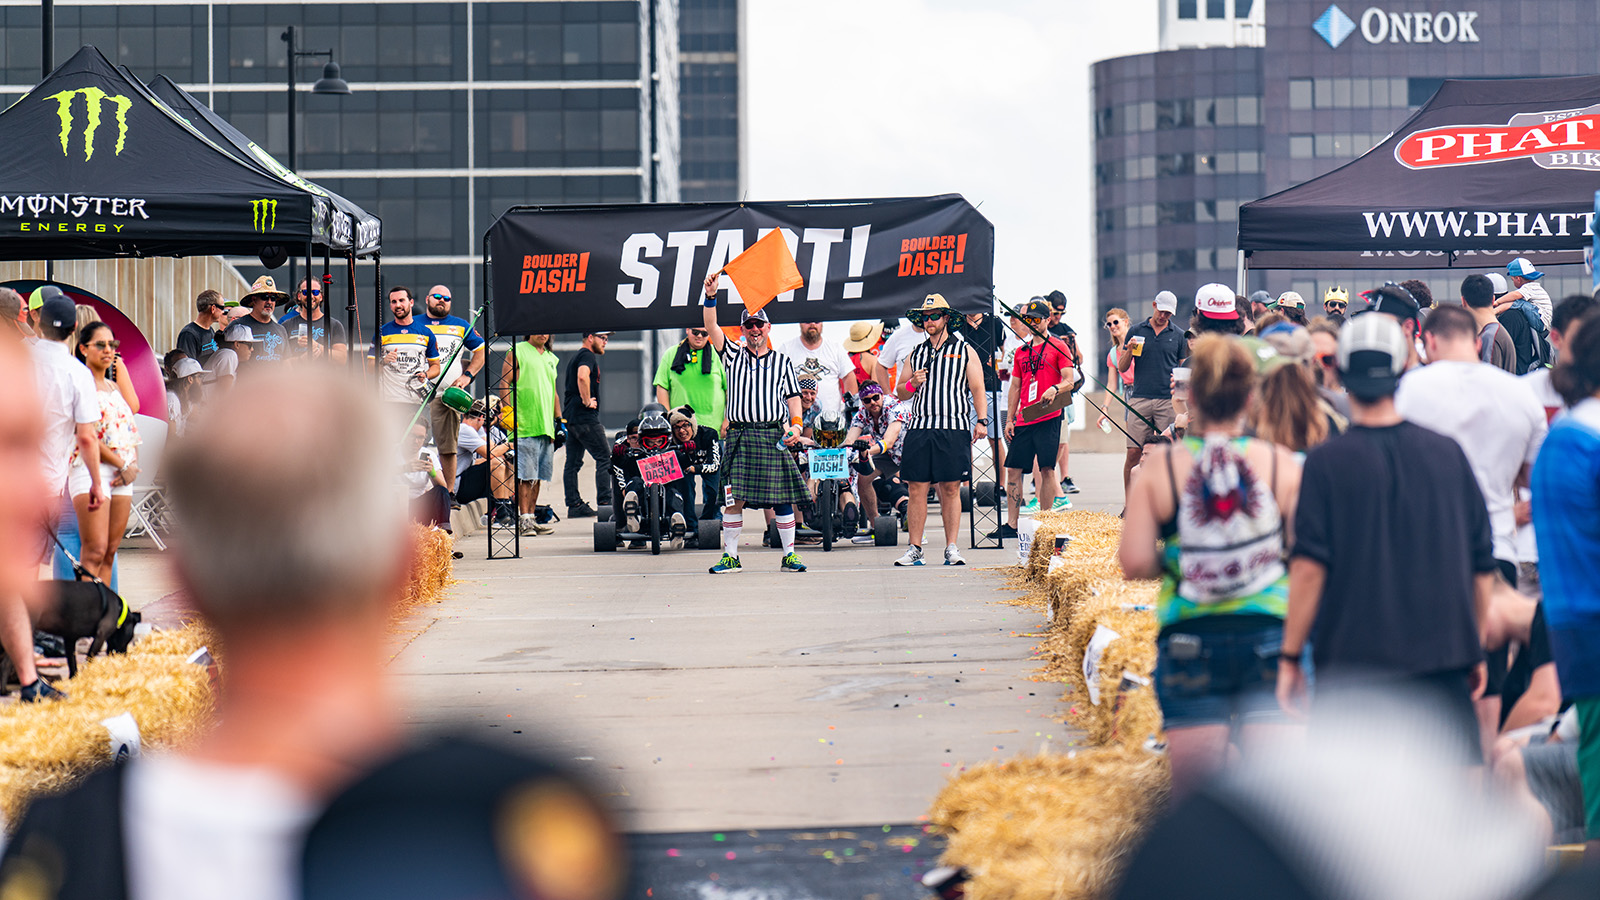 Boulder Dash Tulsa OK picture and link